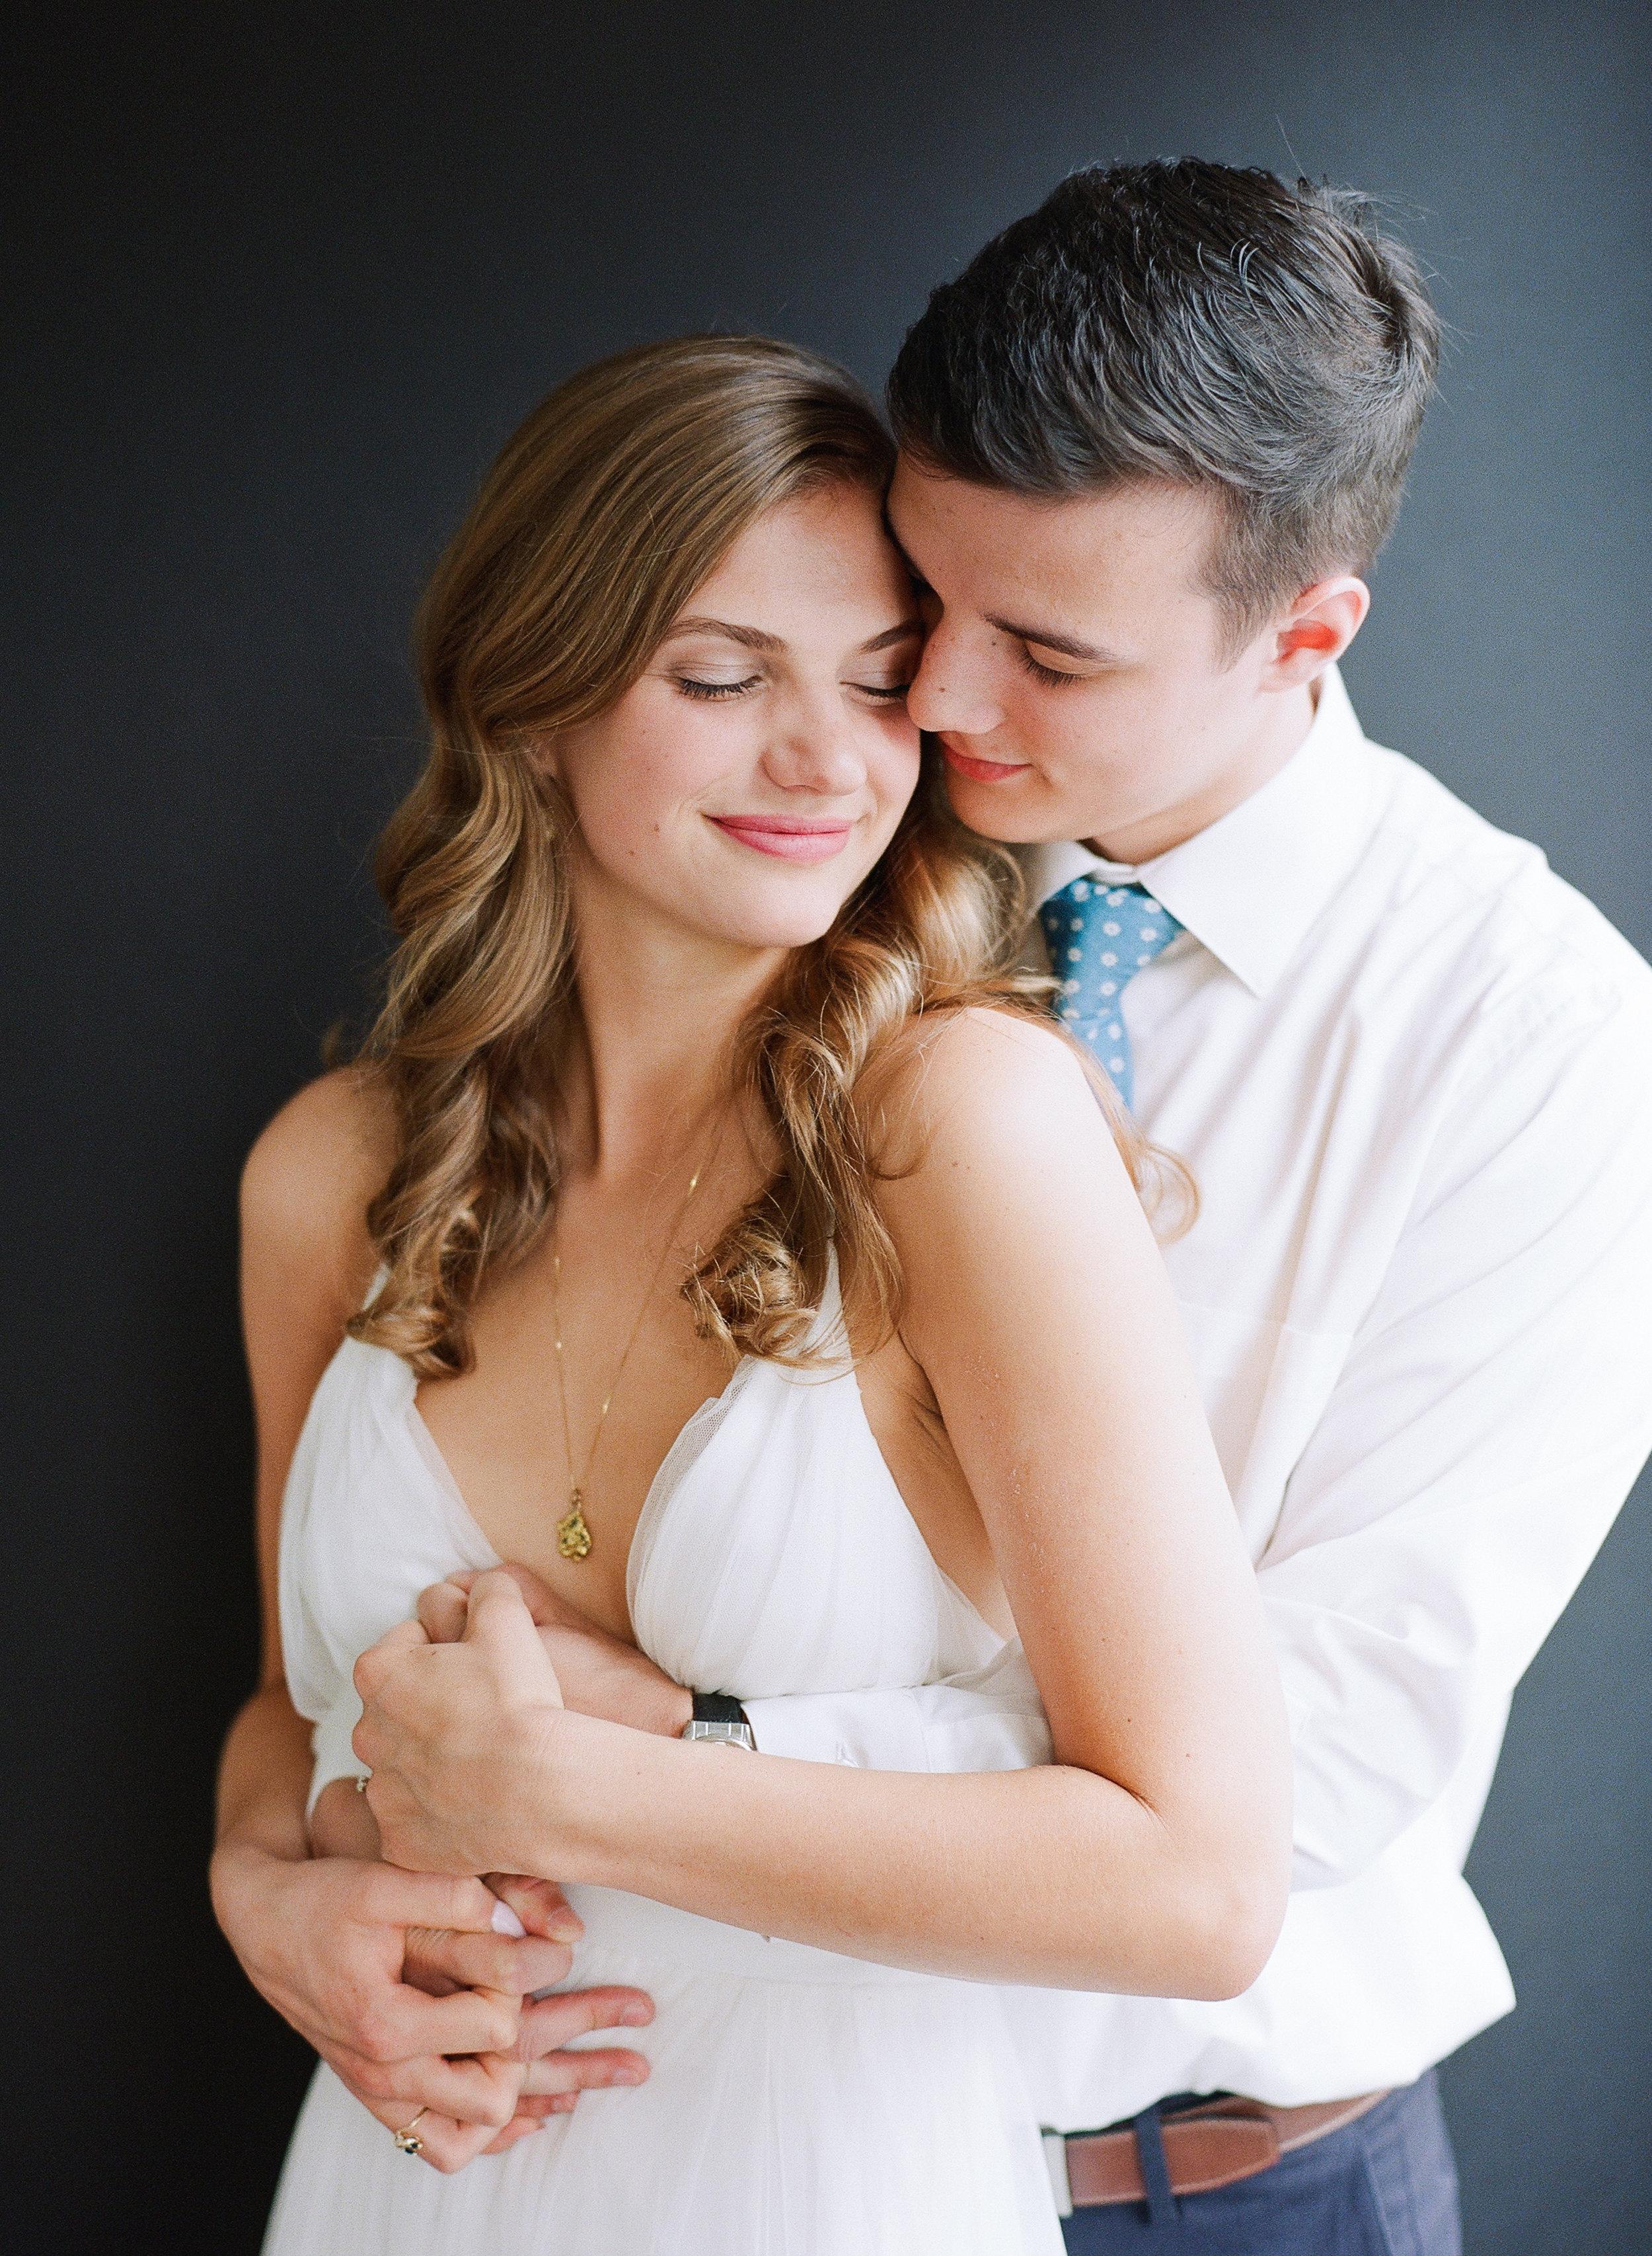 Rachel_Brandon_Engagement_Photos_Knoxville_Abigail_Malone_Phography-75.jpg